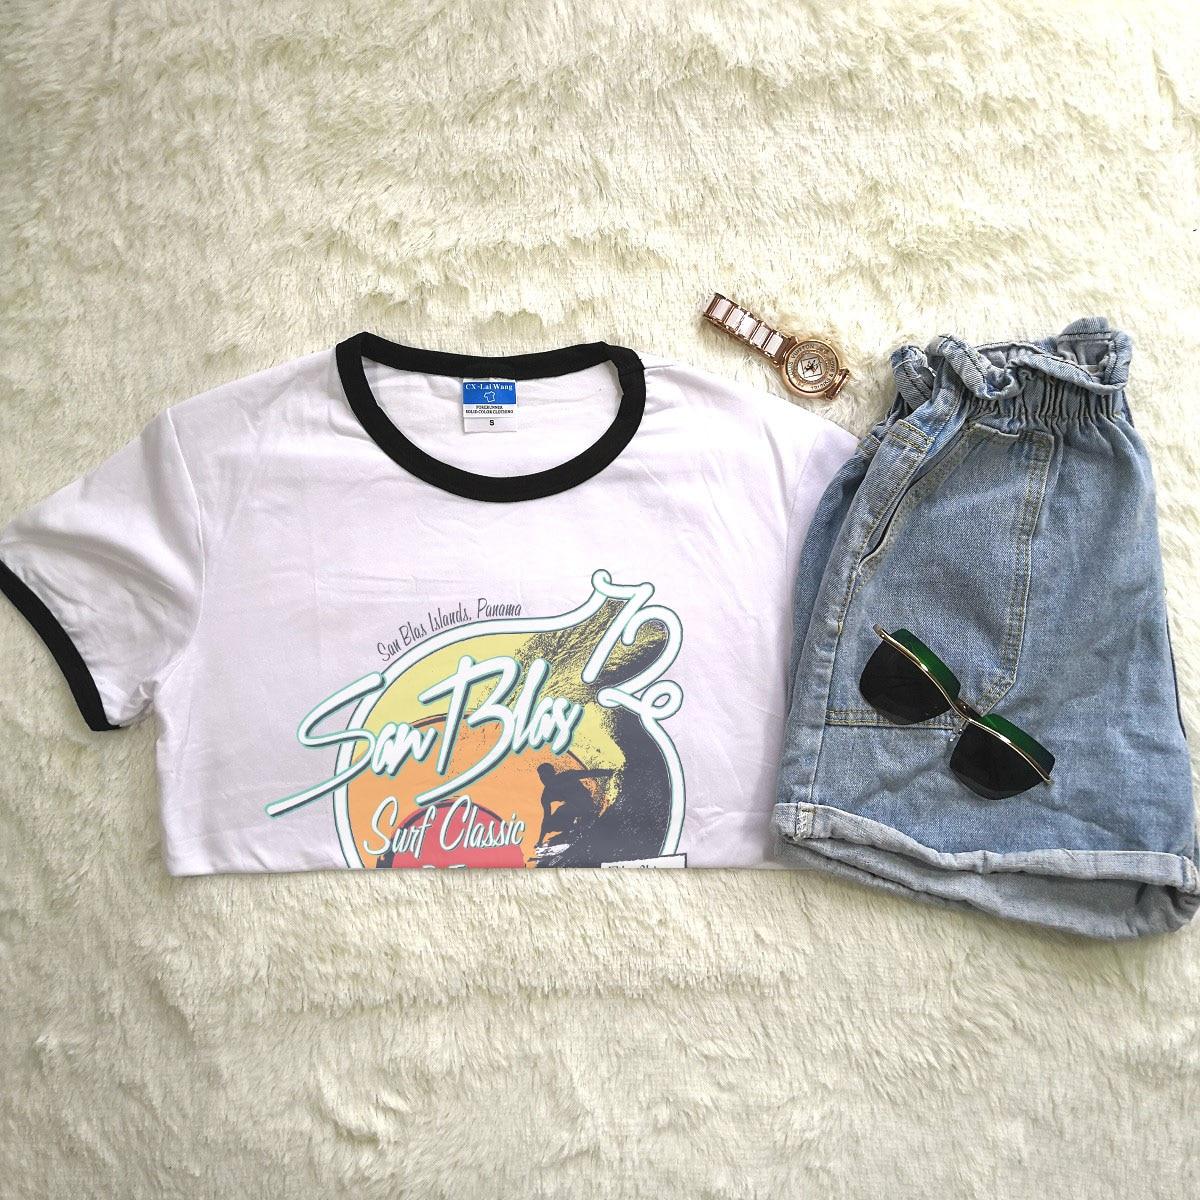 Hillbilly Women Summer O-Neck Tshirt Funny Vintage Tops Novelty Tee Panama Short Sleeved Printed T shirt Women Brand Harajuku